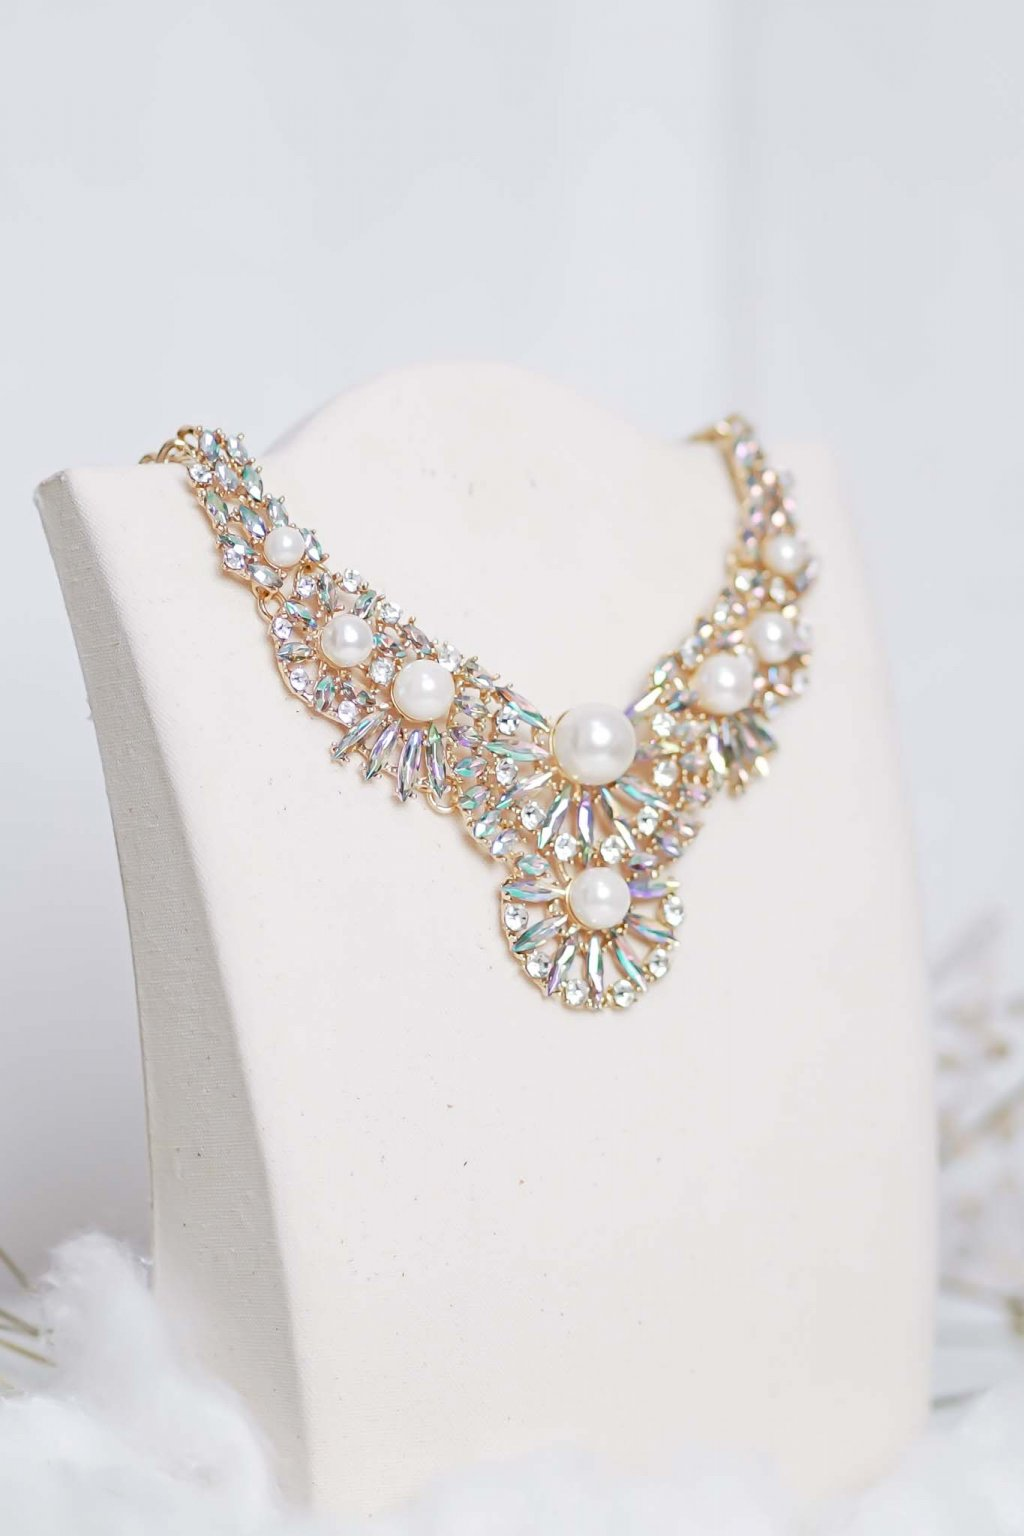 náhrdelník, šperk, spoločenská náhrdelník, náhrdelník na bežný deň, výrazný náhrdelník, jemný náhrdelník, šperky, náhrdelník na ples, svadbu, stužkovú 72